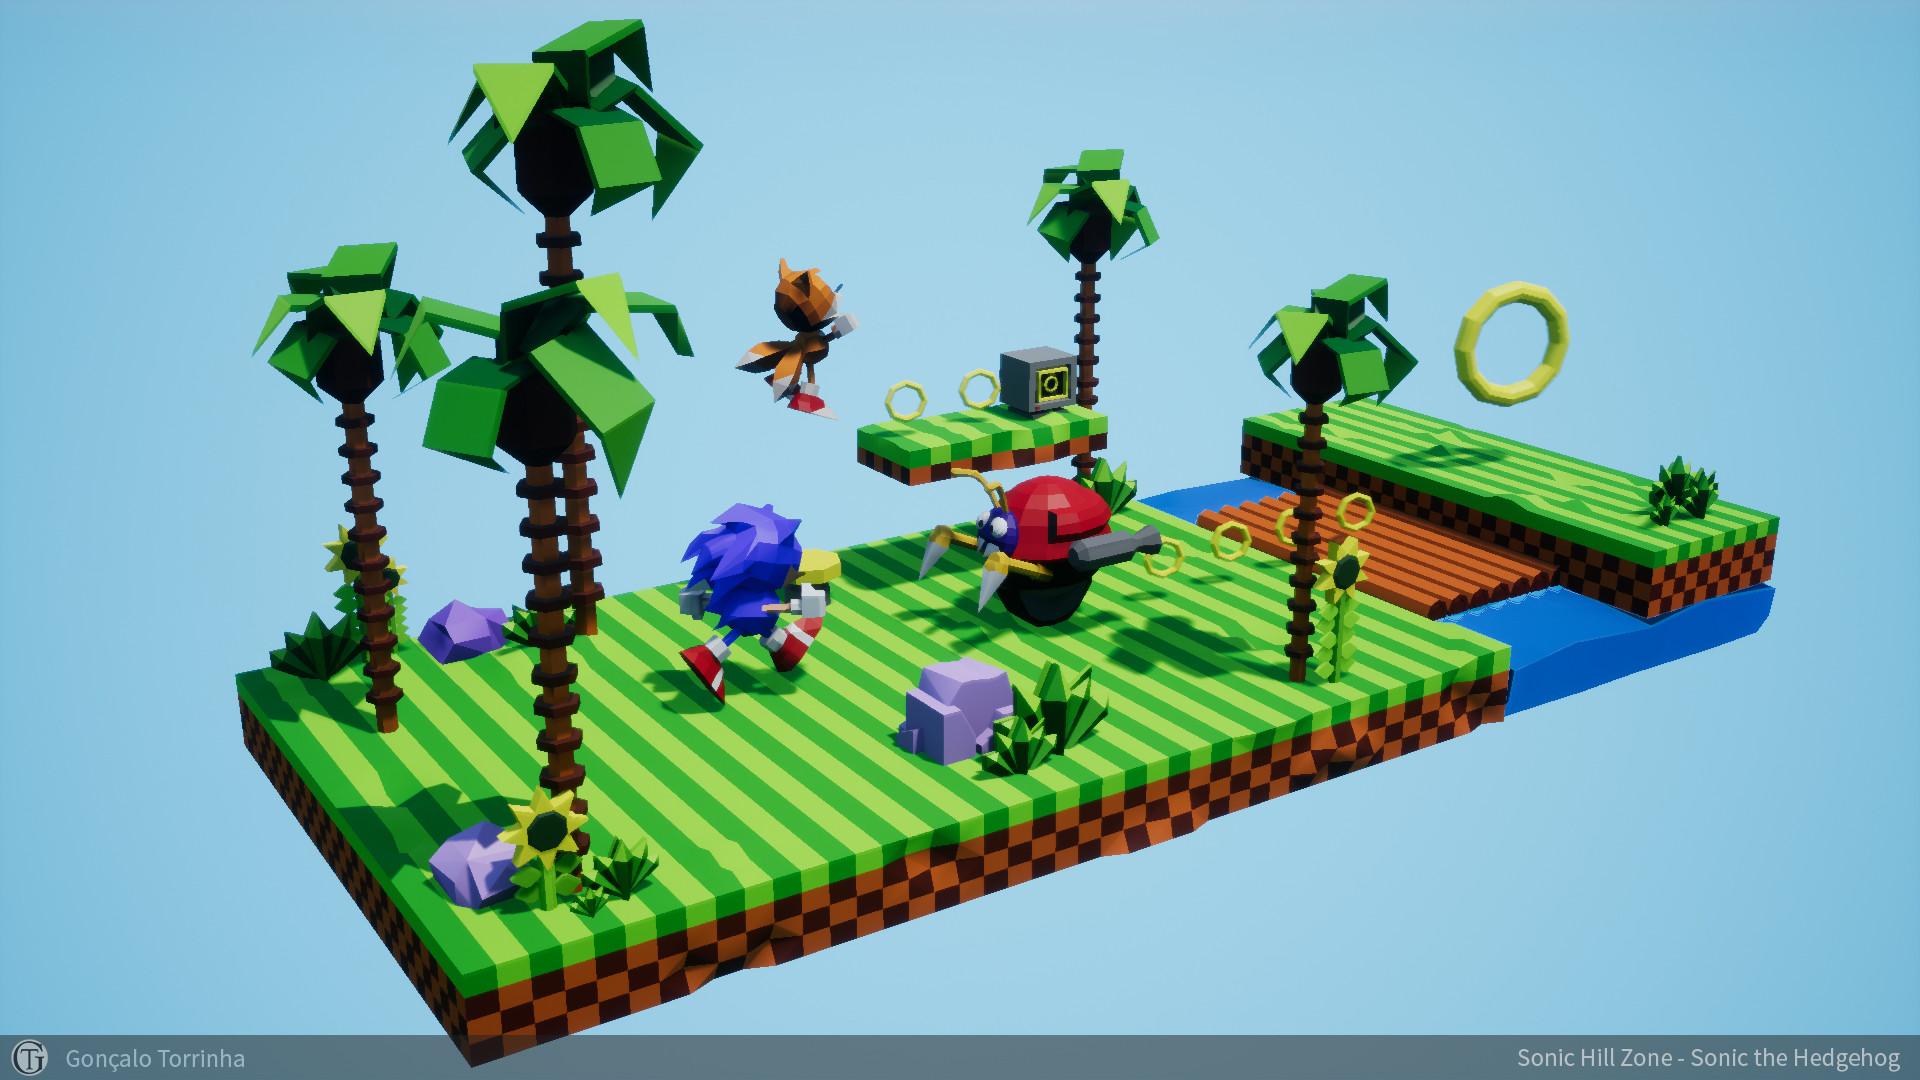 Artstation Sonic Hill Zone Dioramas Sonic The Hedgehog Goncalo Torrinha